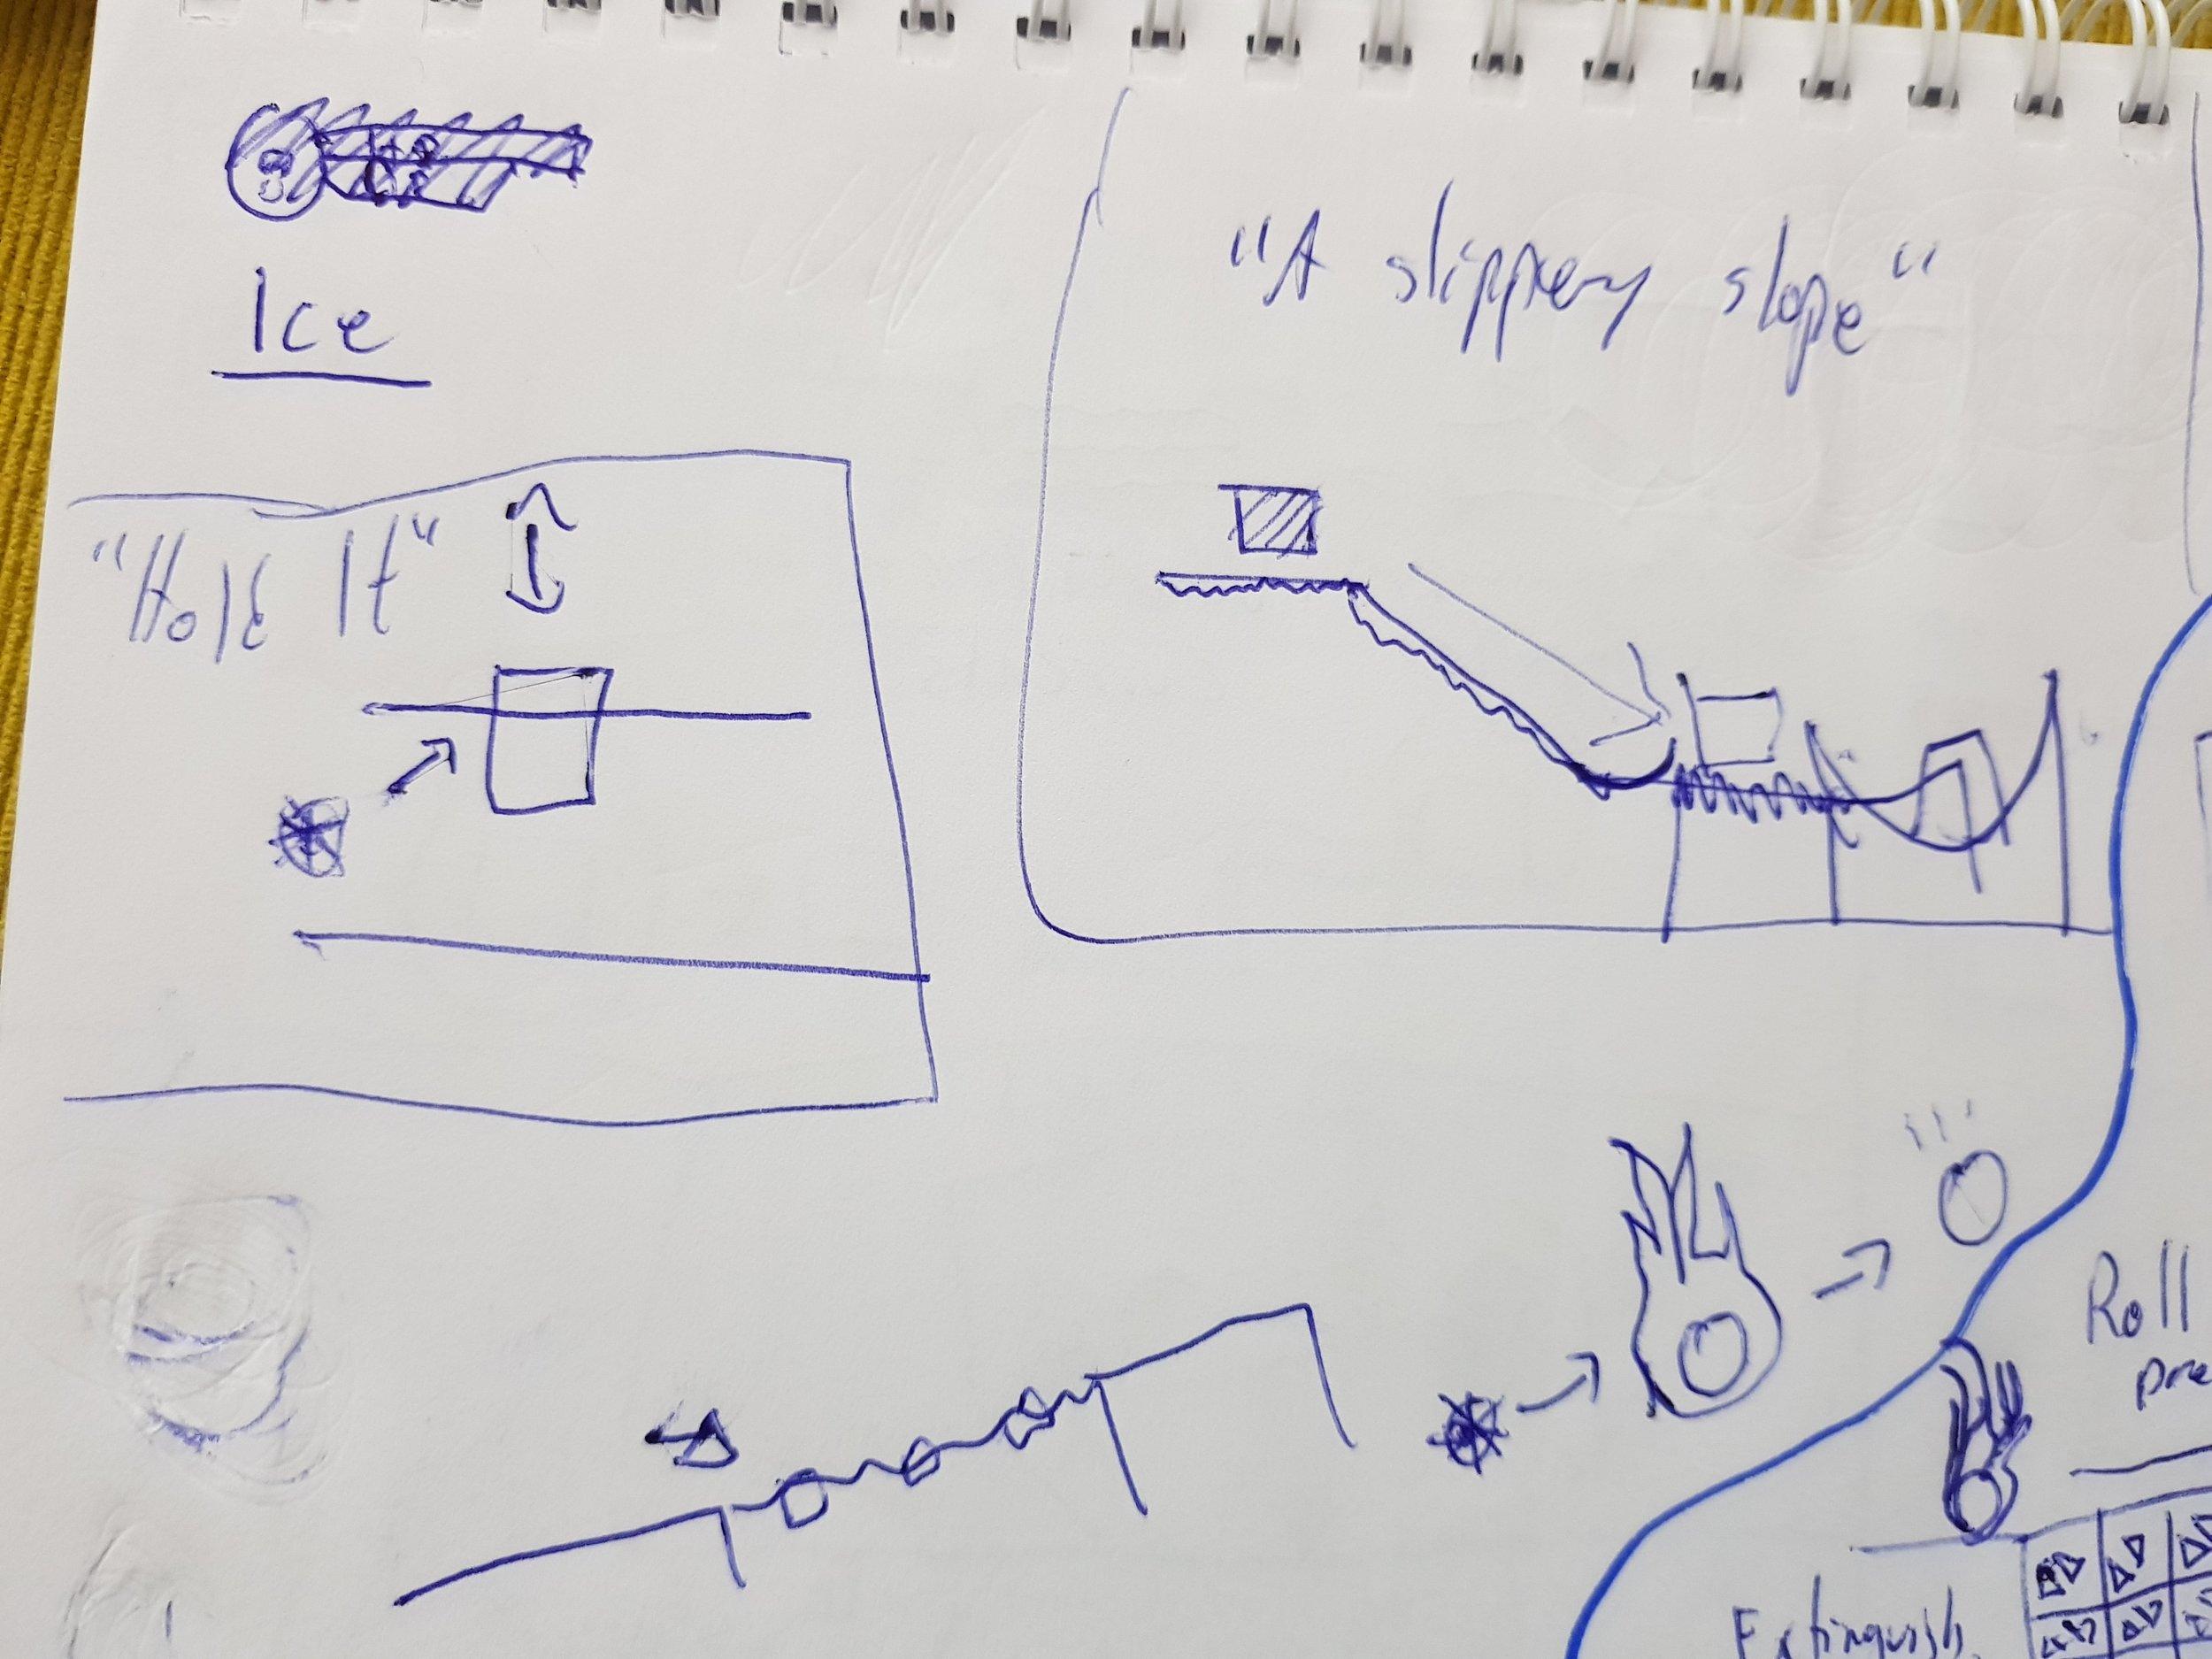 Figure 3: Ice puzzle sketches